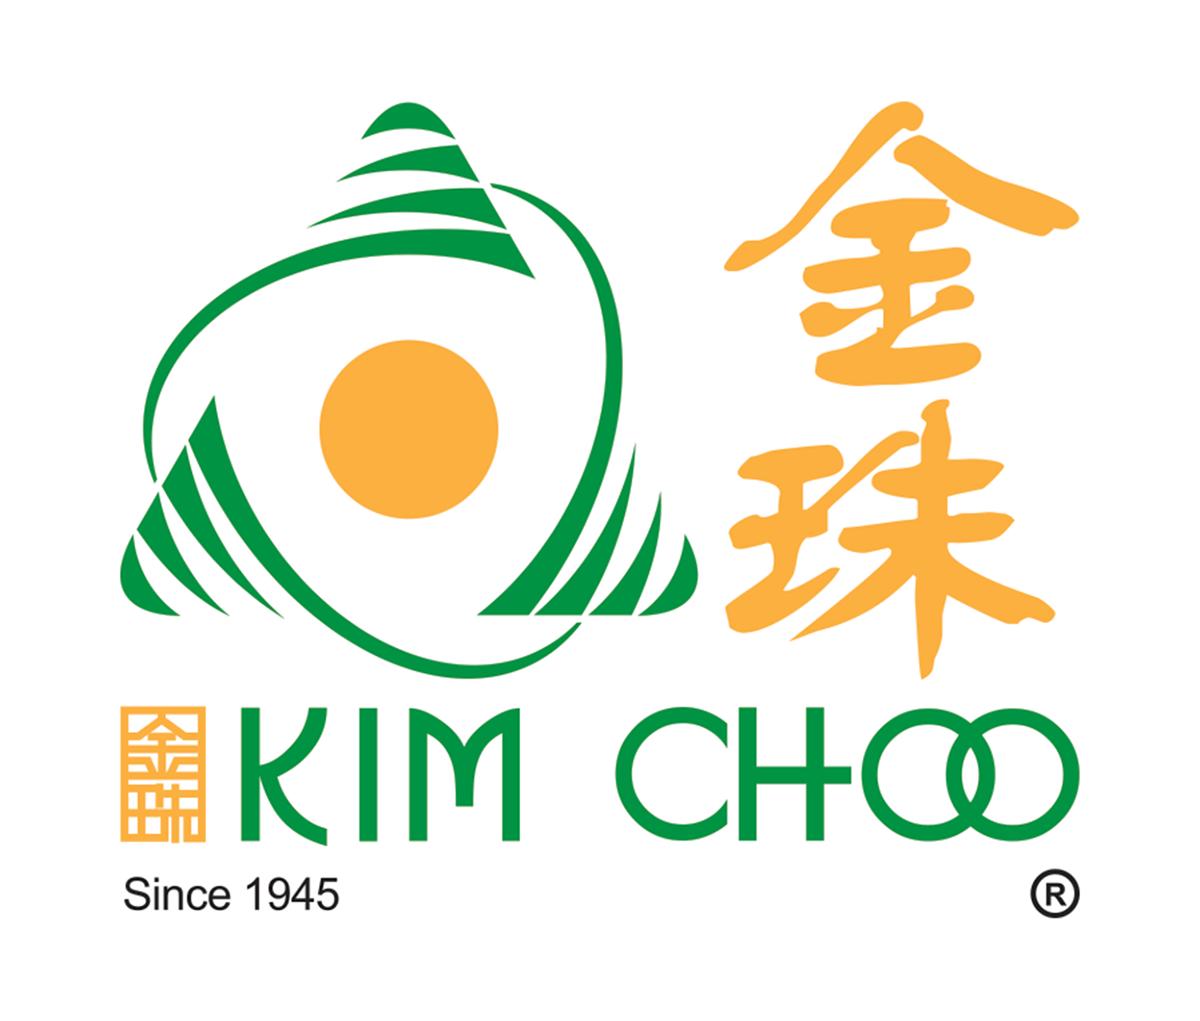 Kim Choo Holdings Pte Ltd